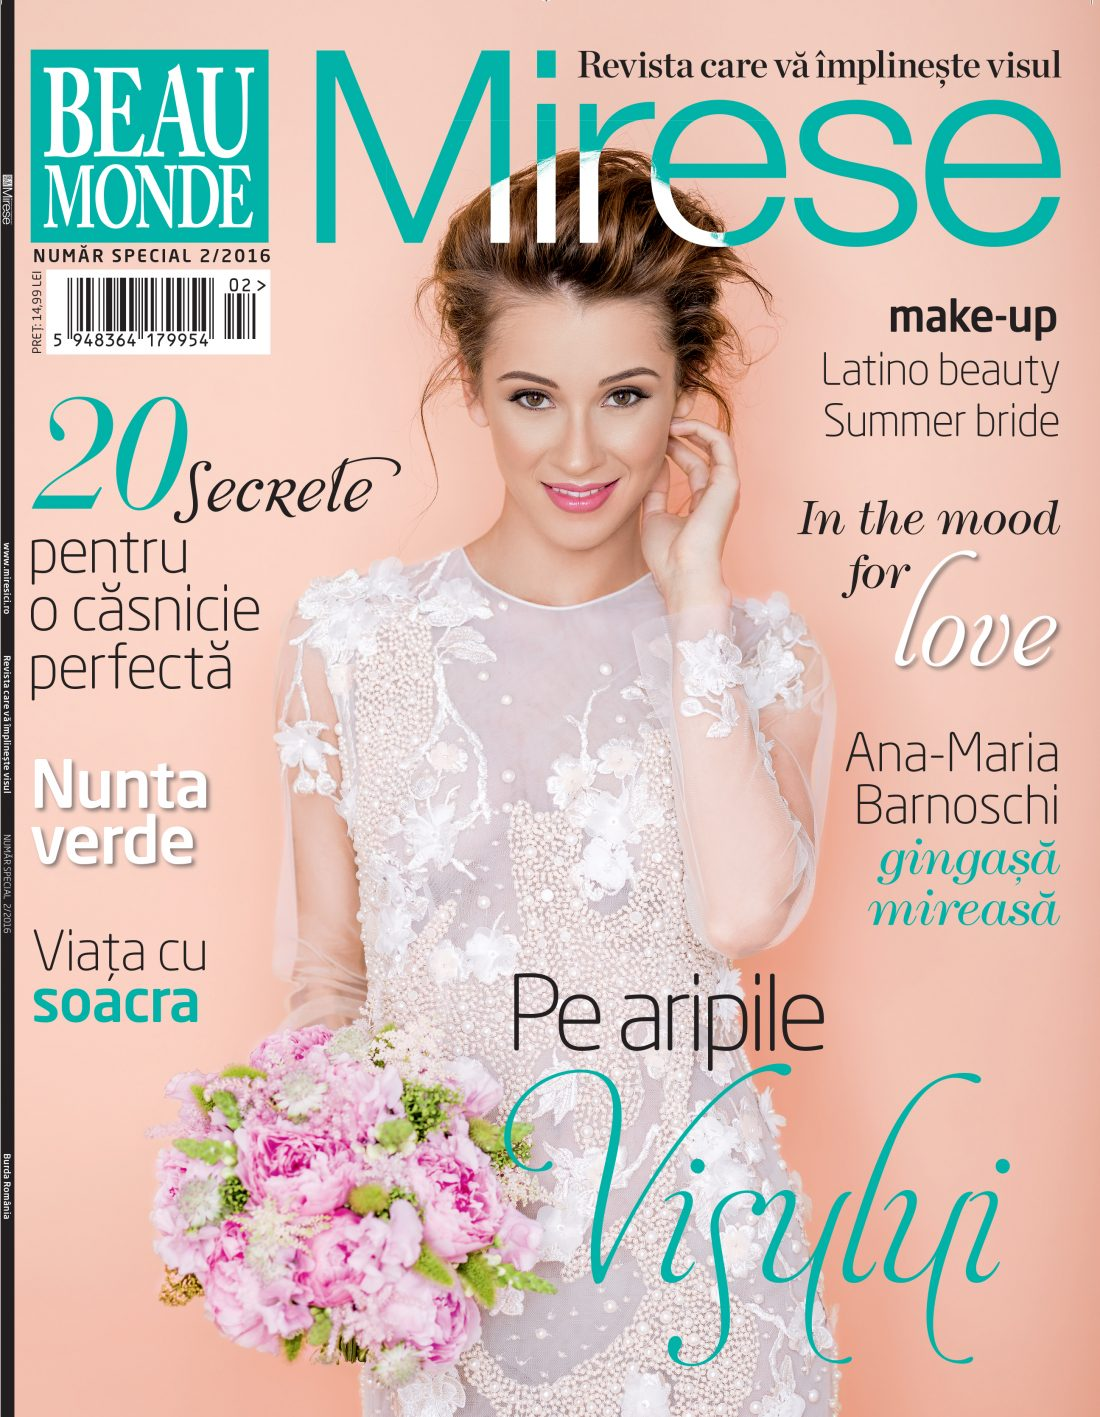 Beau Monde Mirese Cover | Tania Cozma makeup